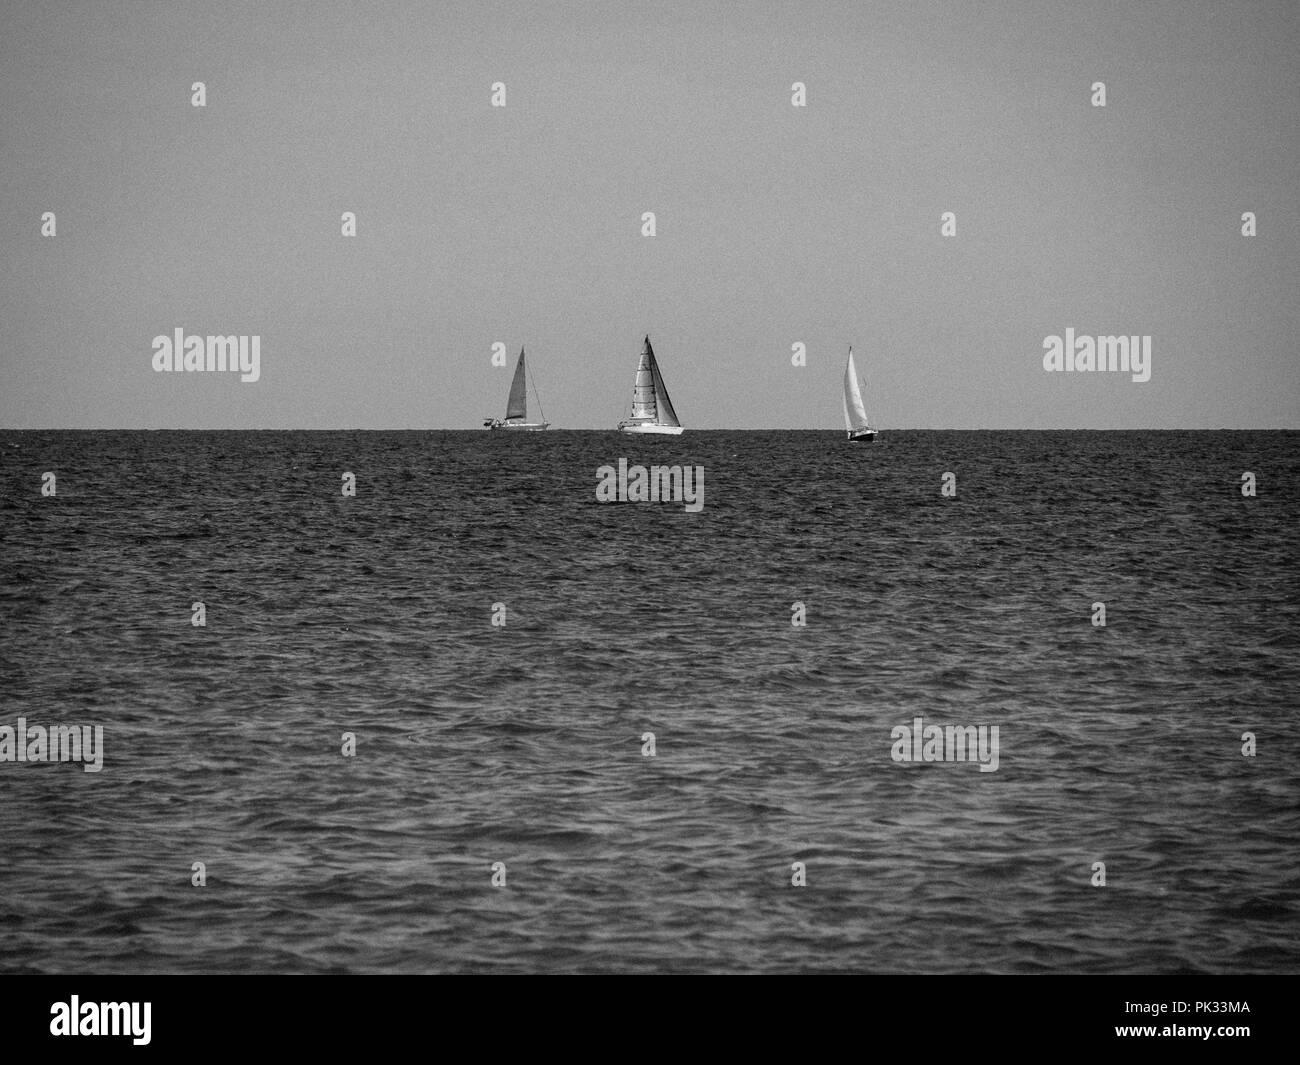 Sailing Baltic Sea, Møns Klint, Mon Island, Denmark, Europe. Stock Photo